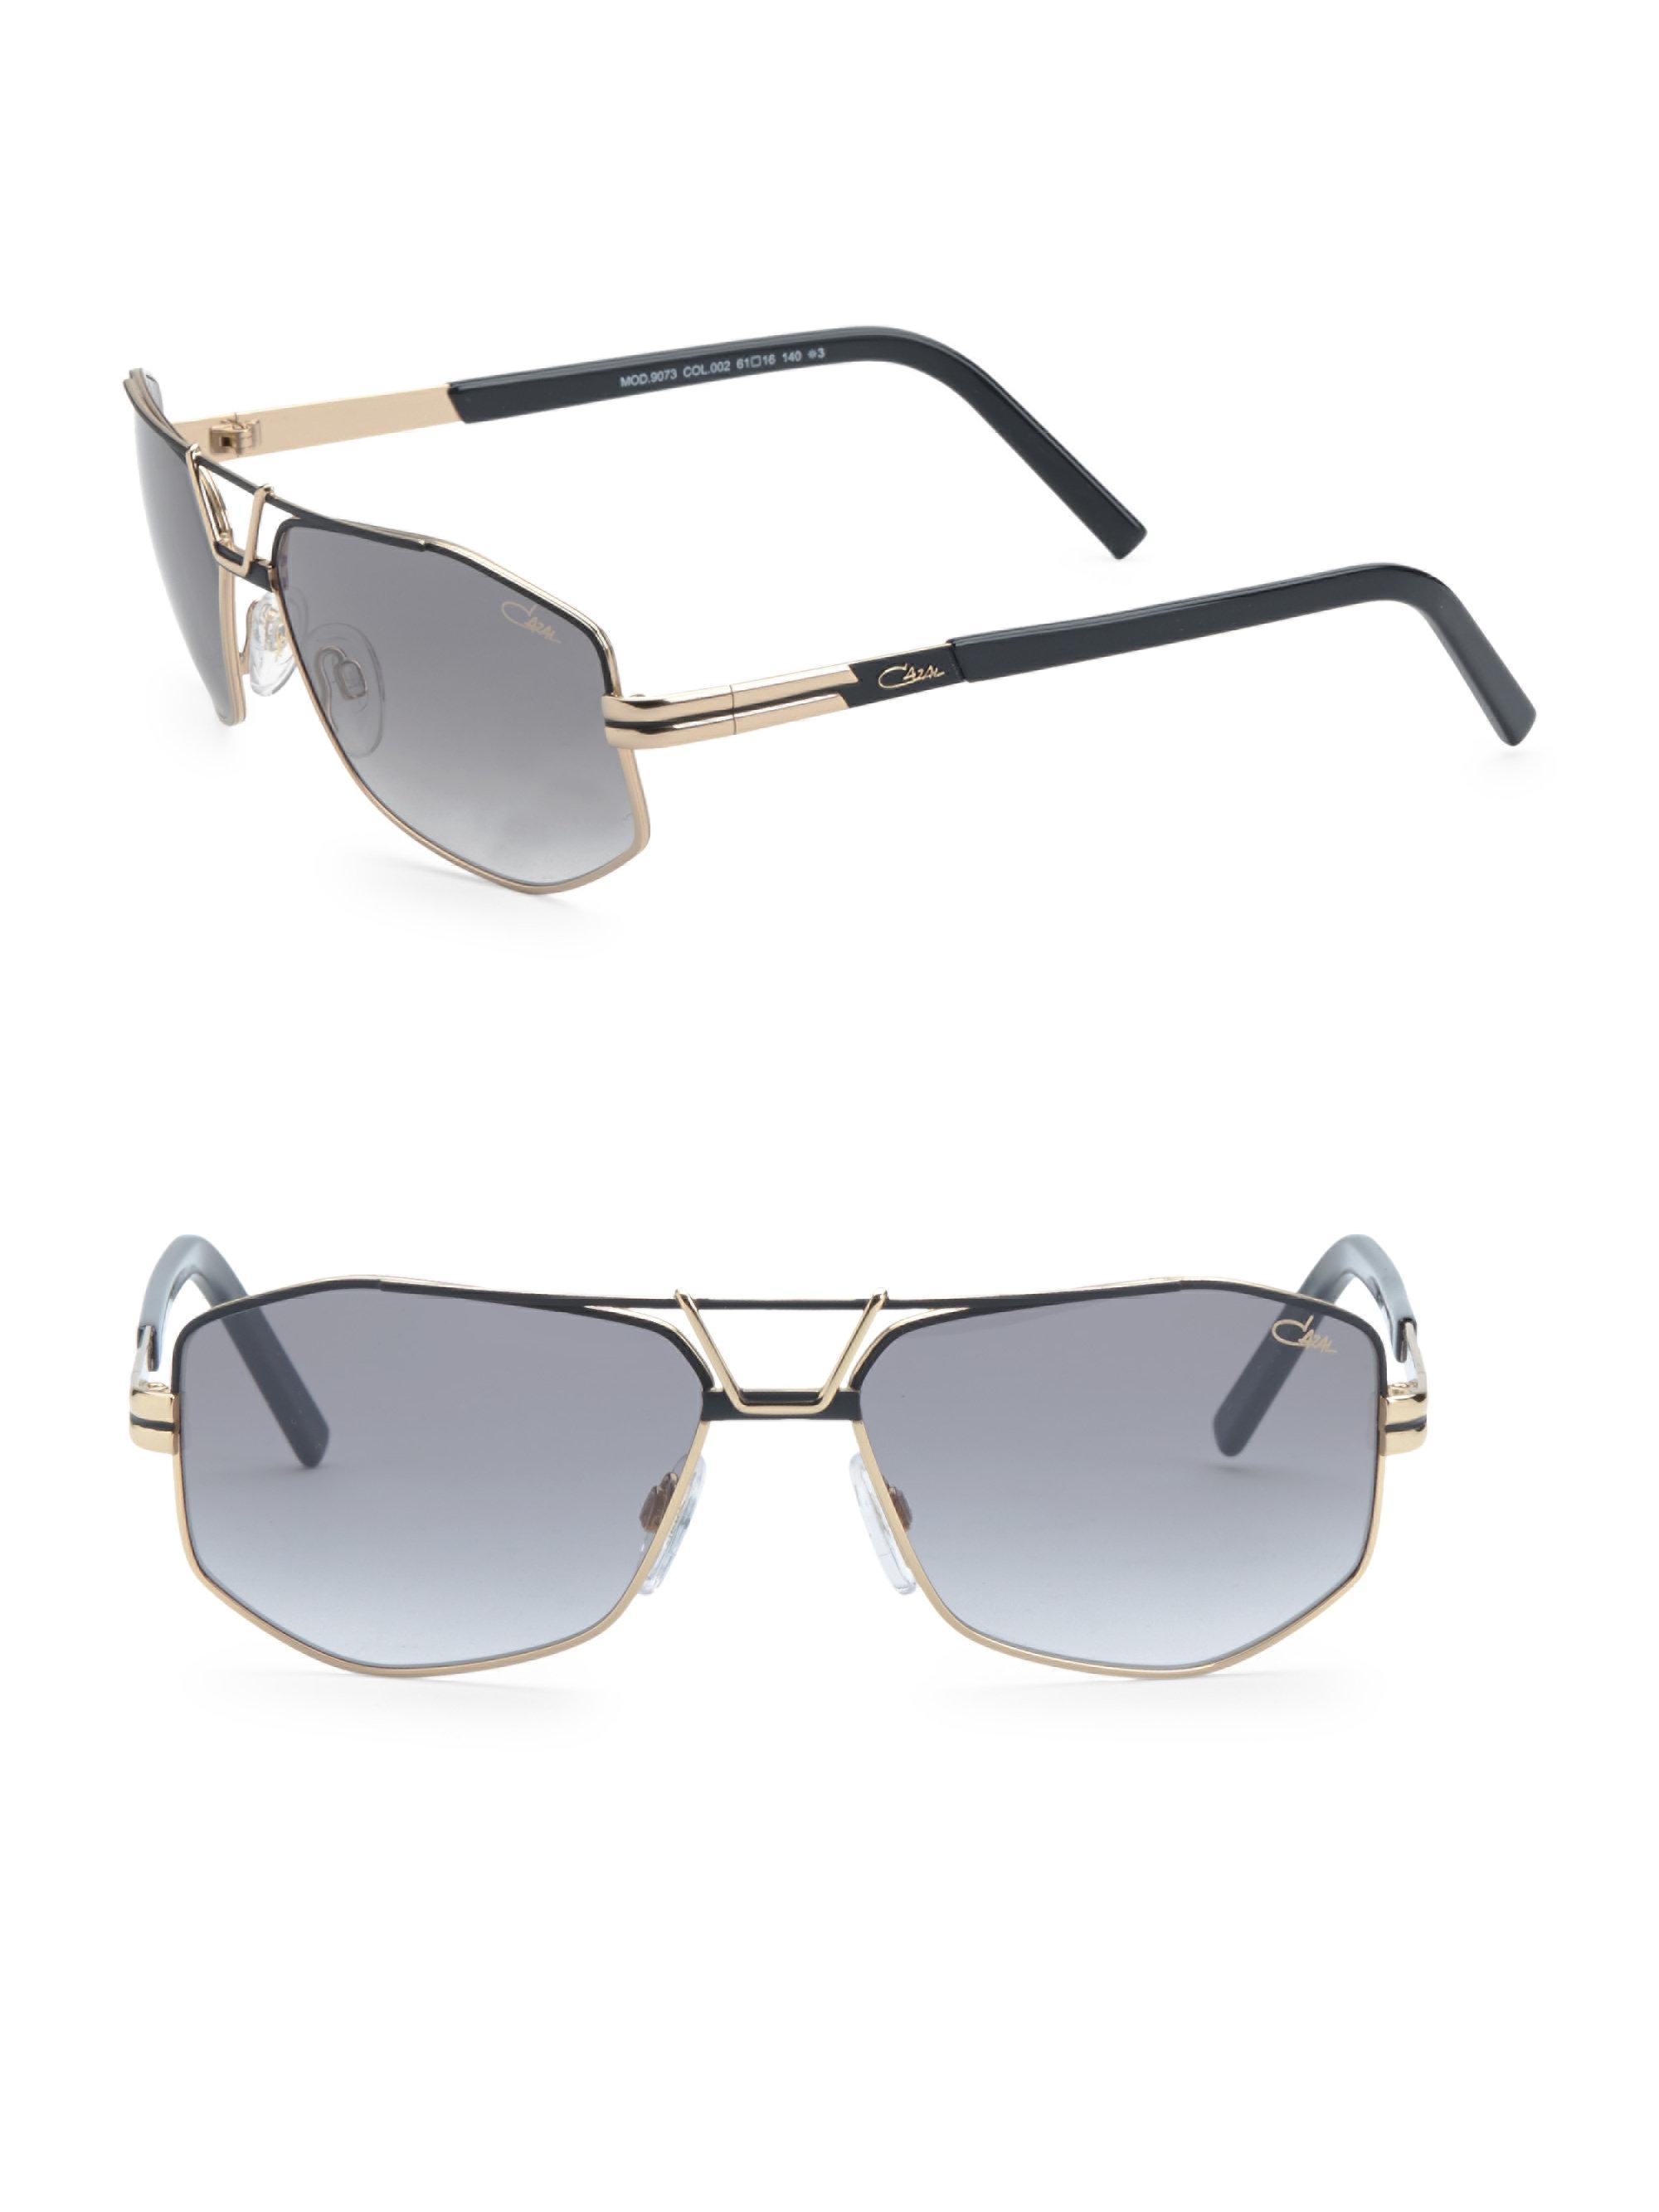 b7eefa1840 Cazal - Black 61mm Modified Aviator Sunglasses for Men - Lyst. View  fullscreen